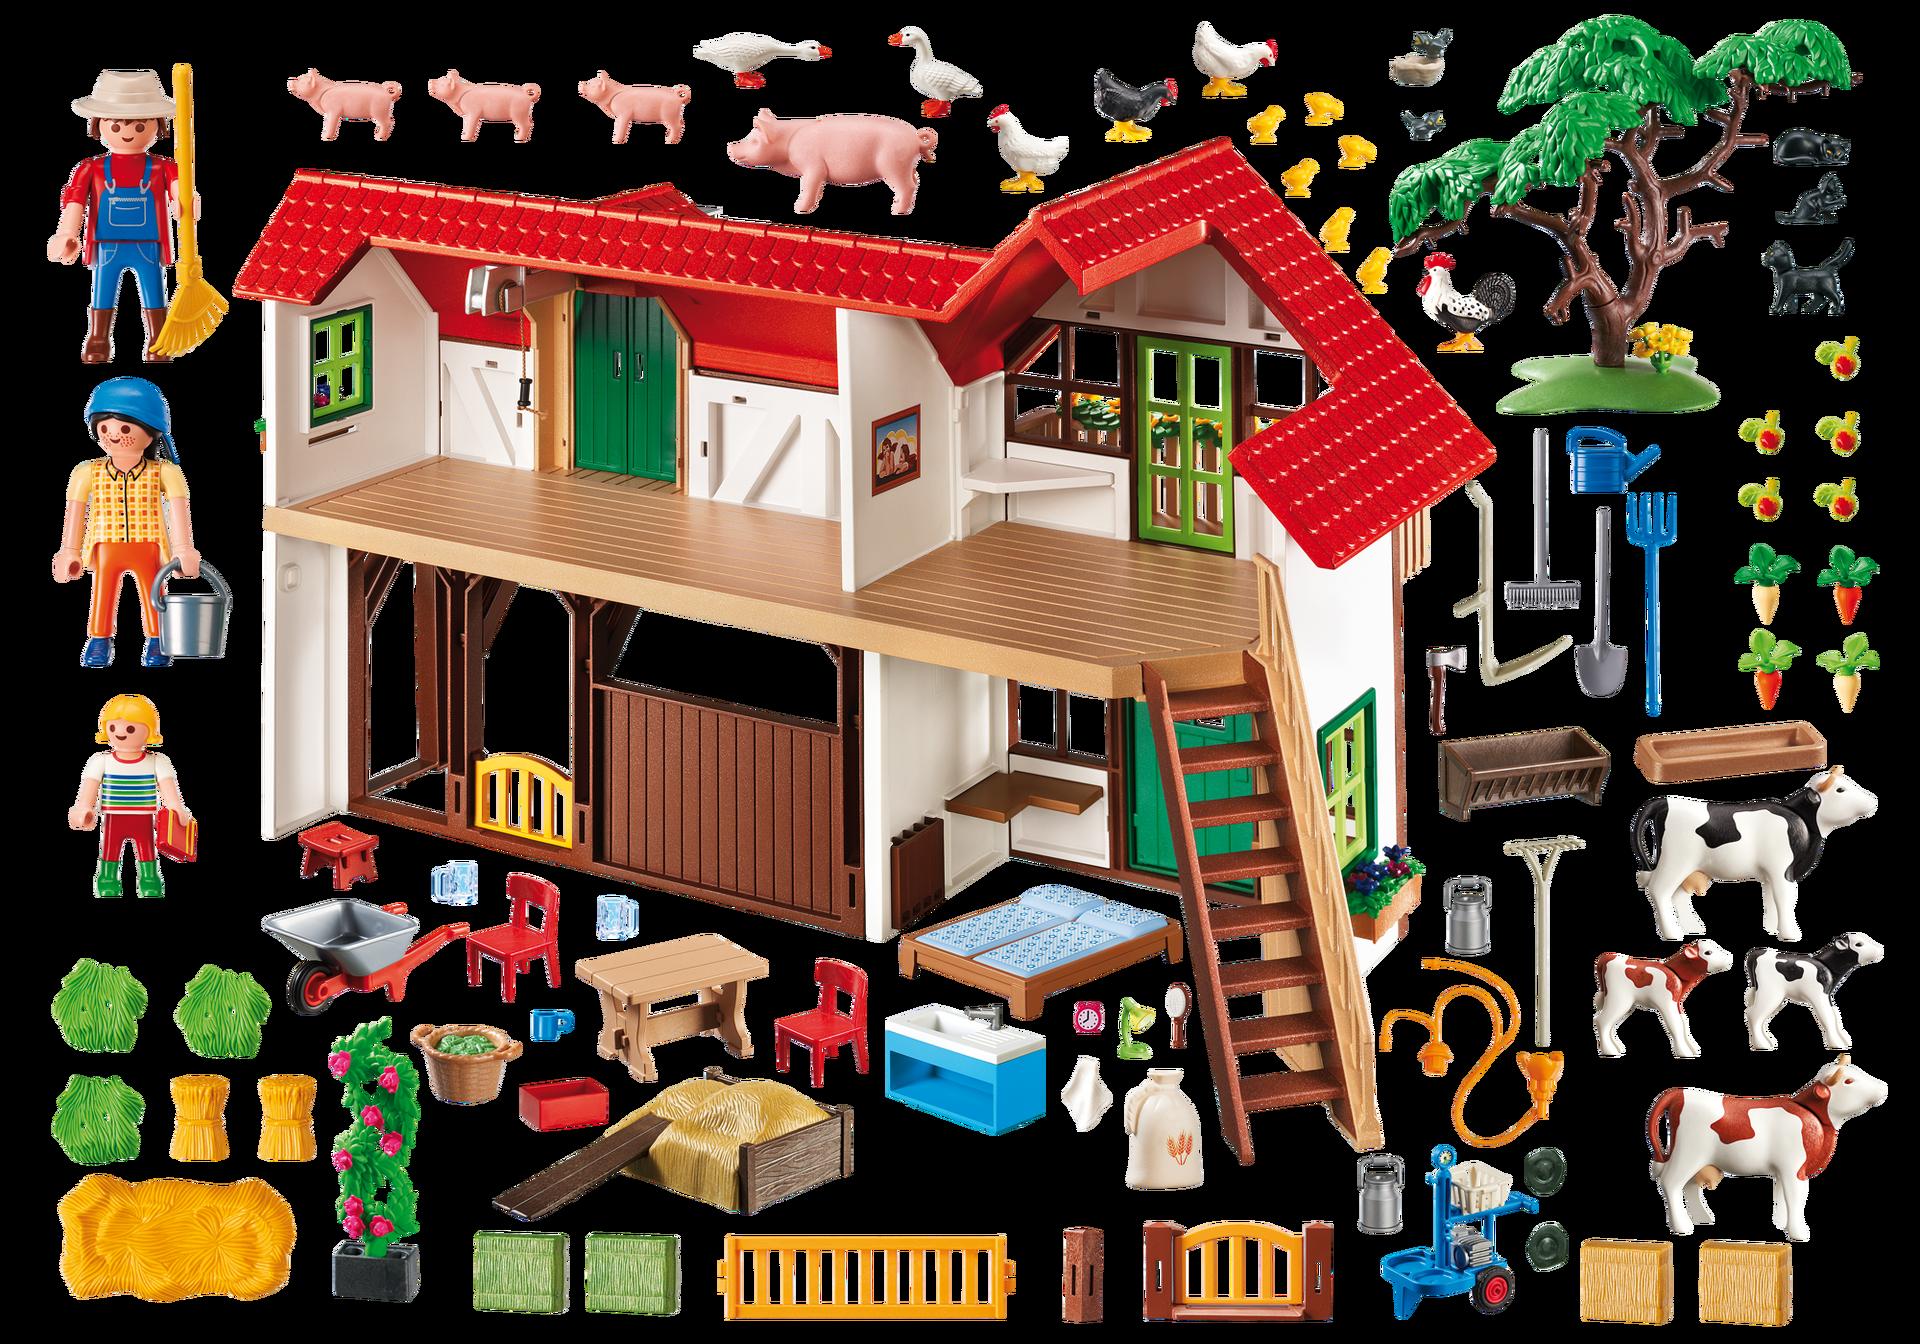 Grote boerderij 6120 playmobil nederland for La granja de playmobil precio